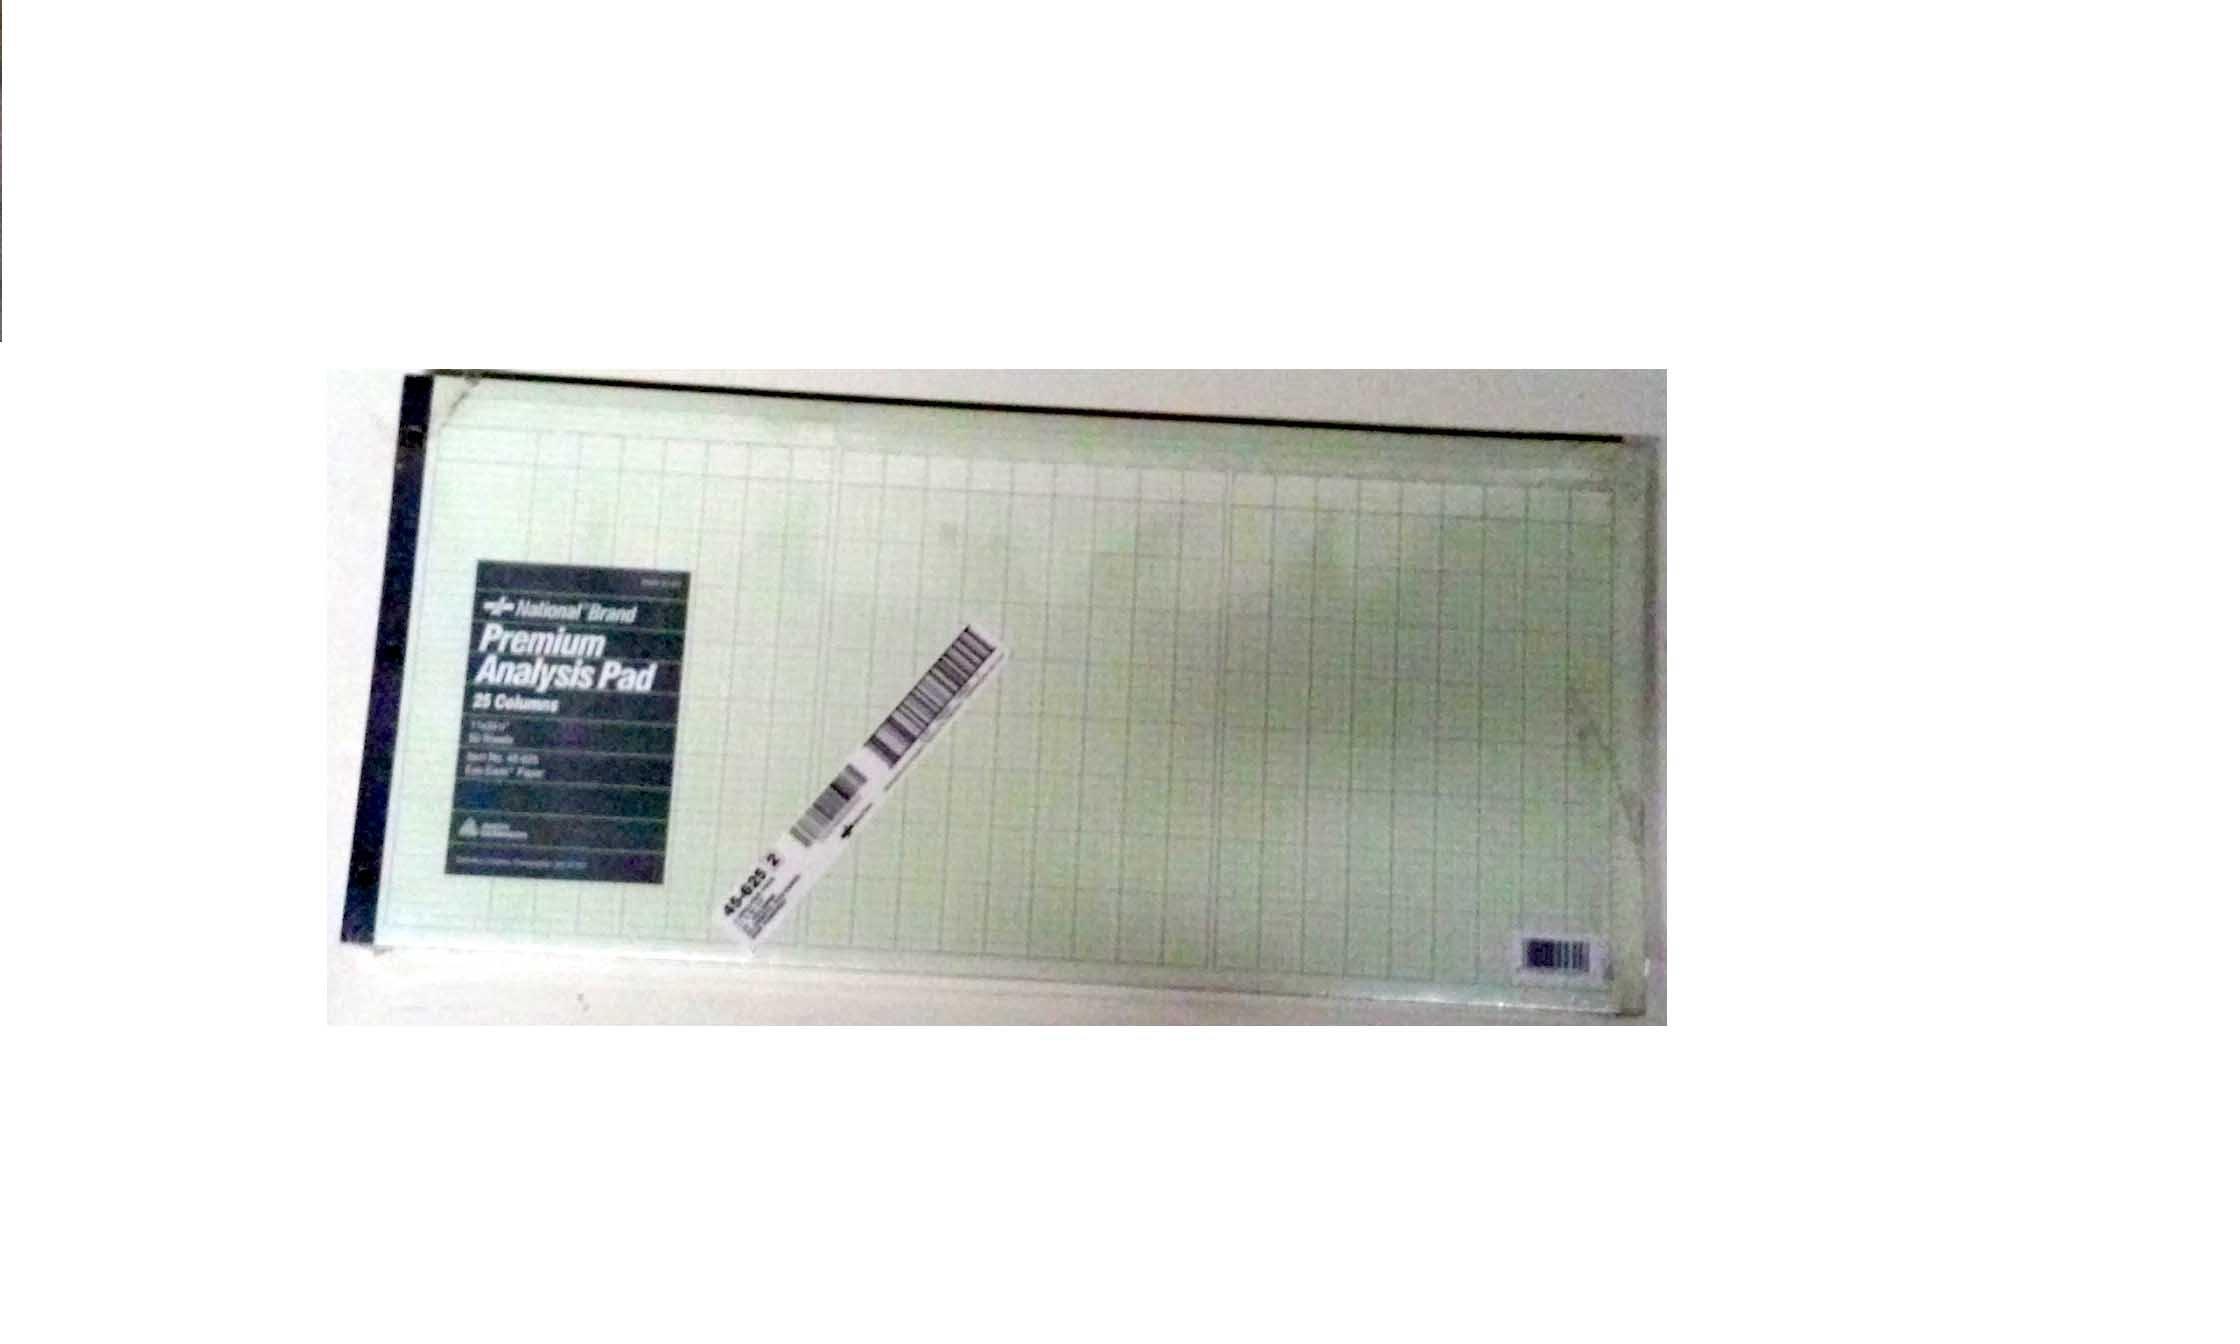 National Brand, Columnar Pad, #45-625, 11'' x 24-1/4'', Description Space 1-7/8''